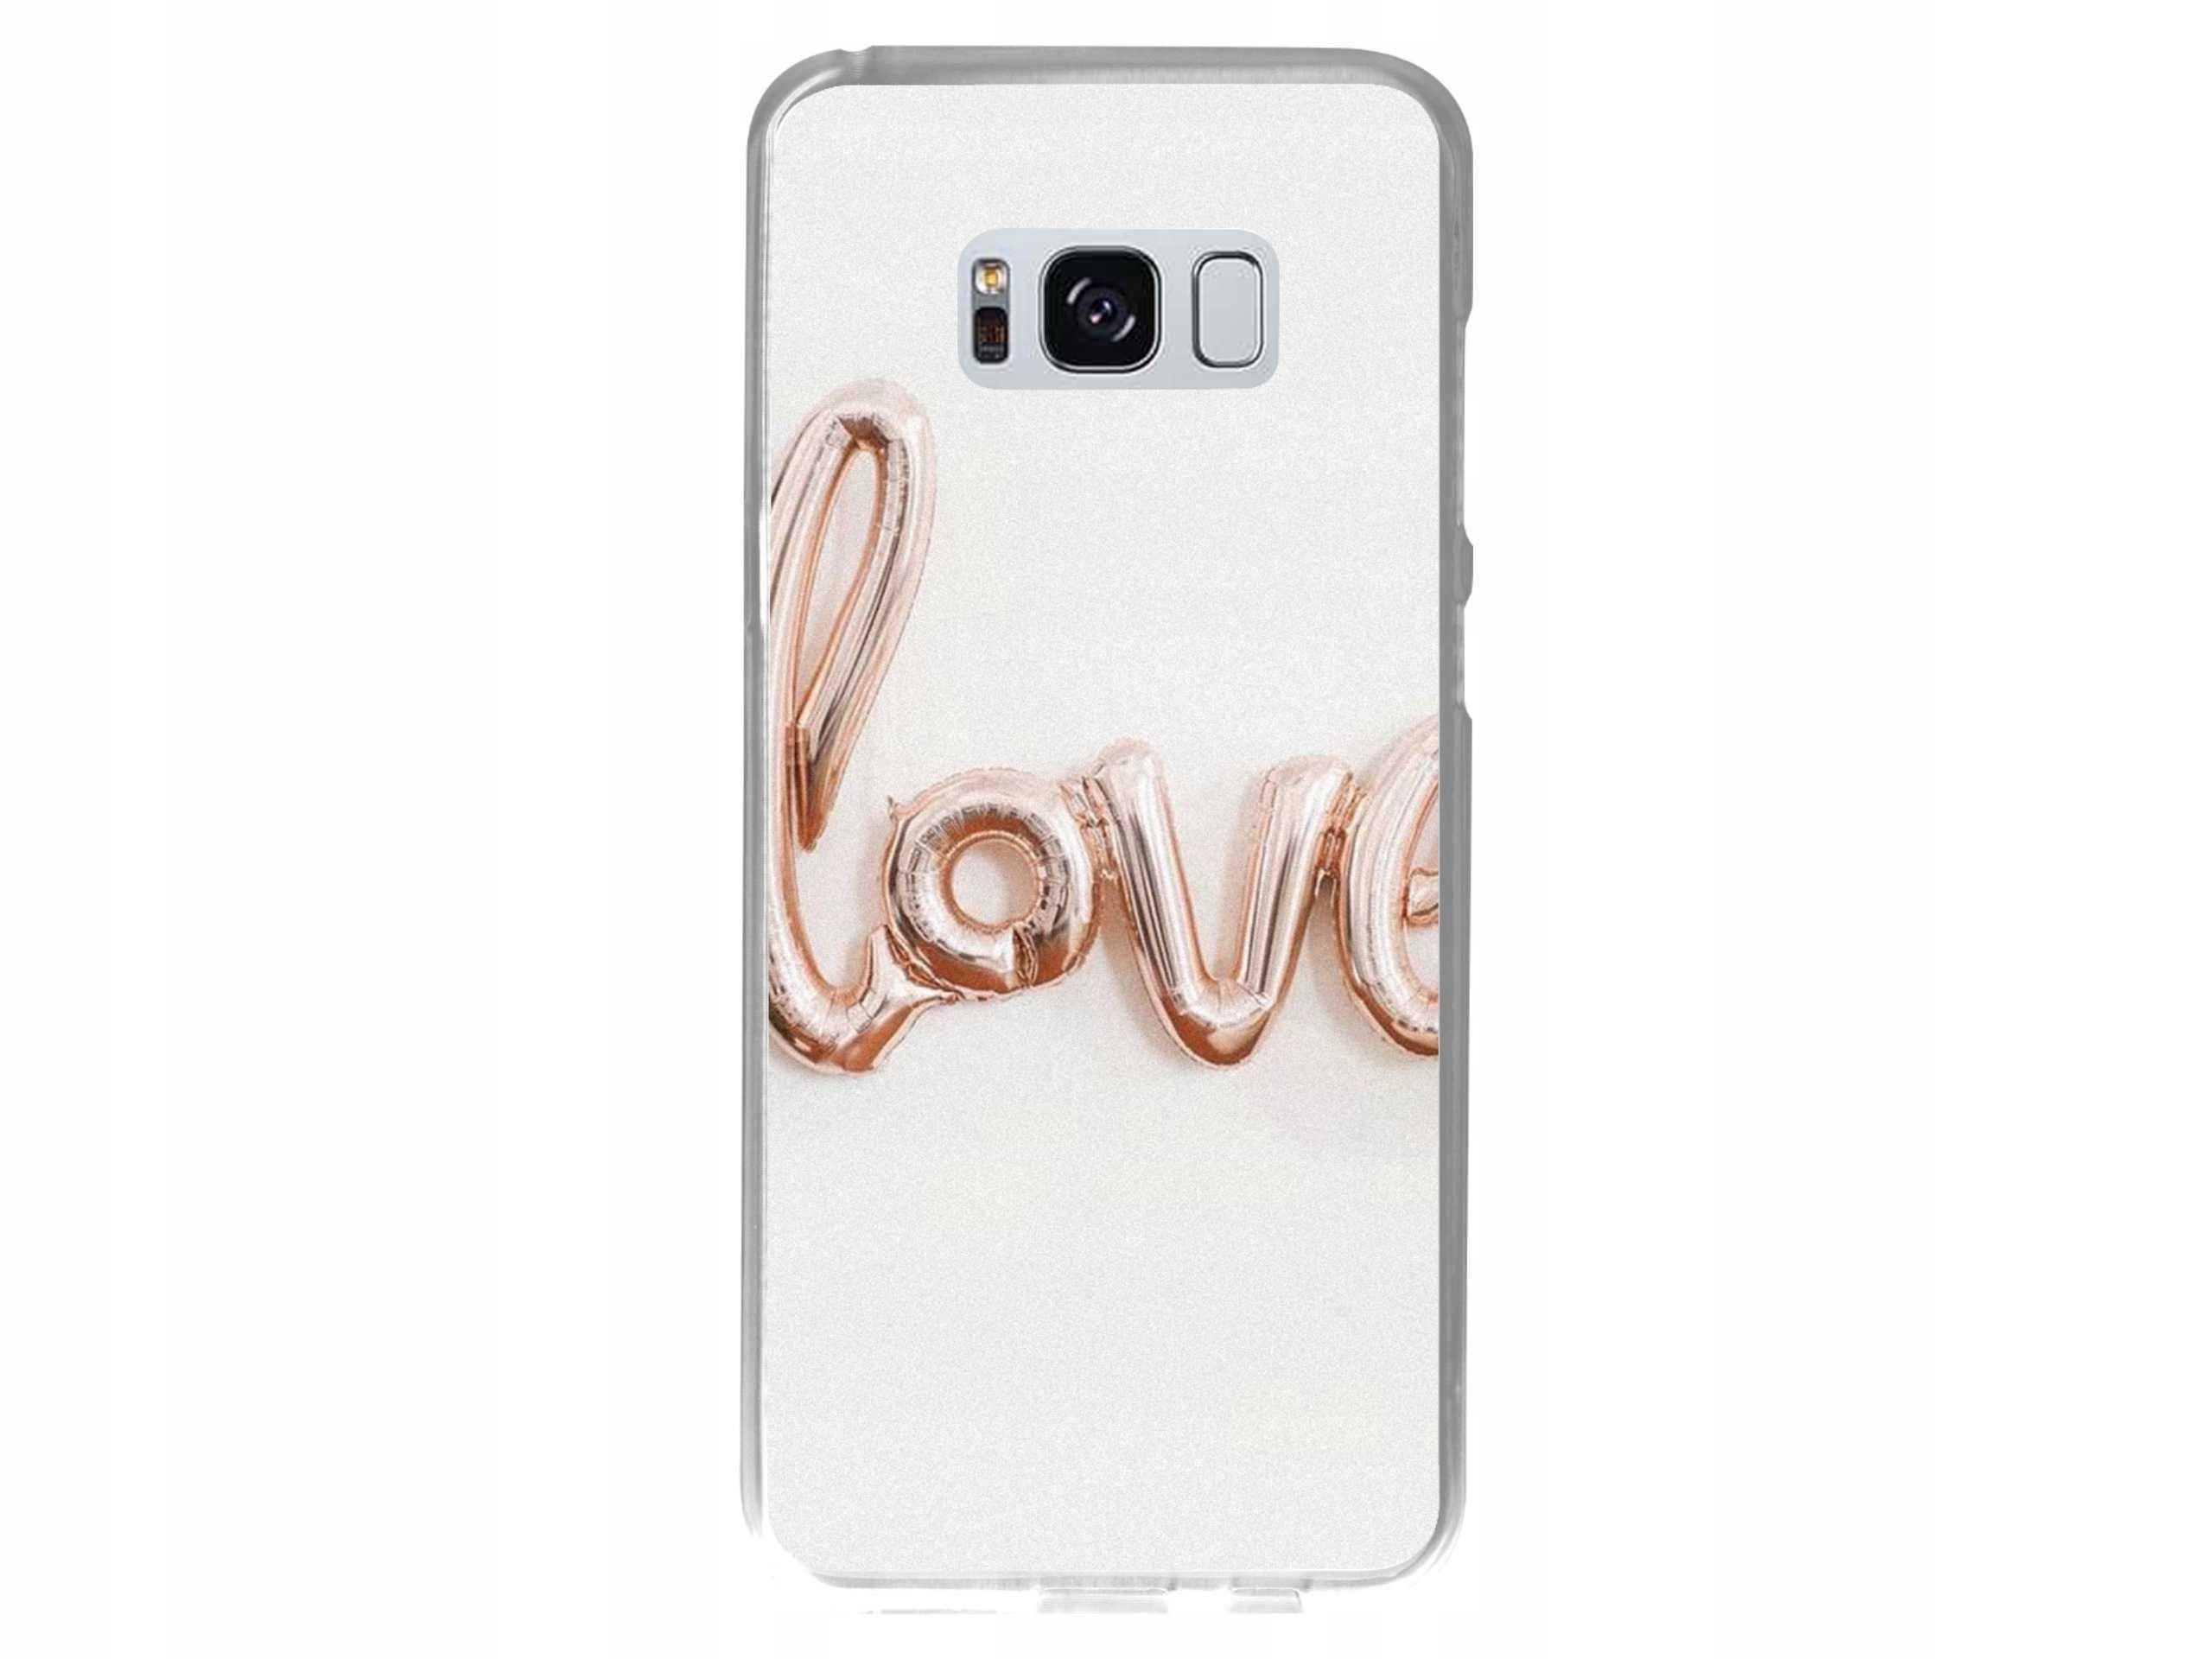 Samsung Galaxy S8 Plus Etui CASE na telefon